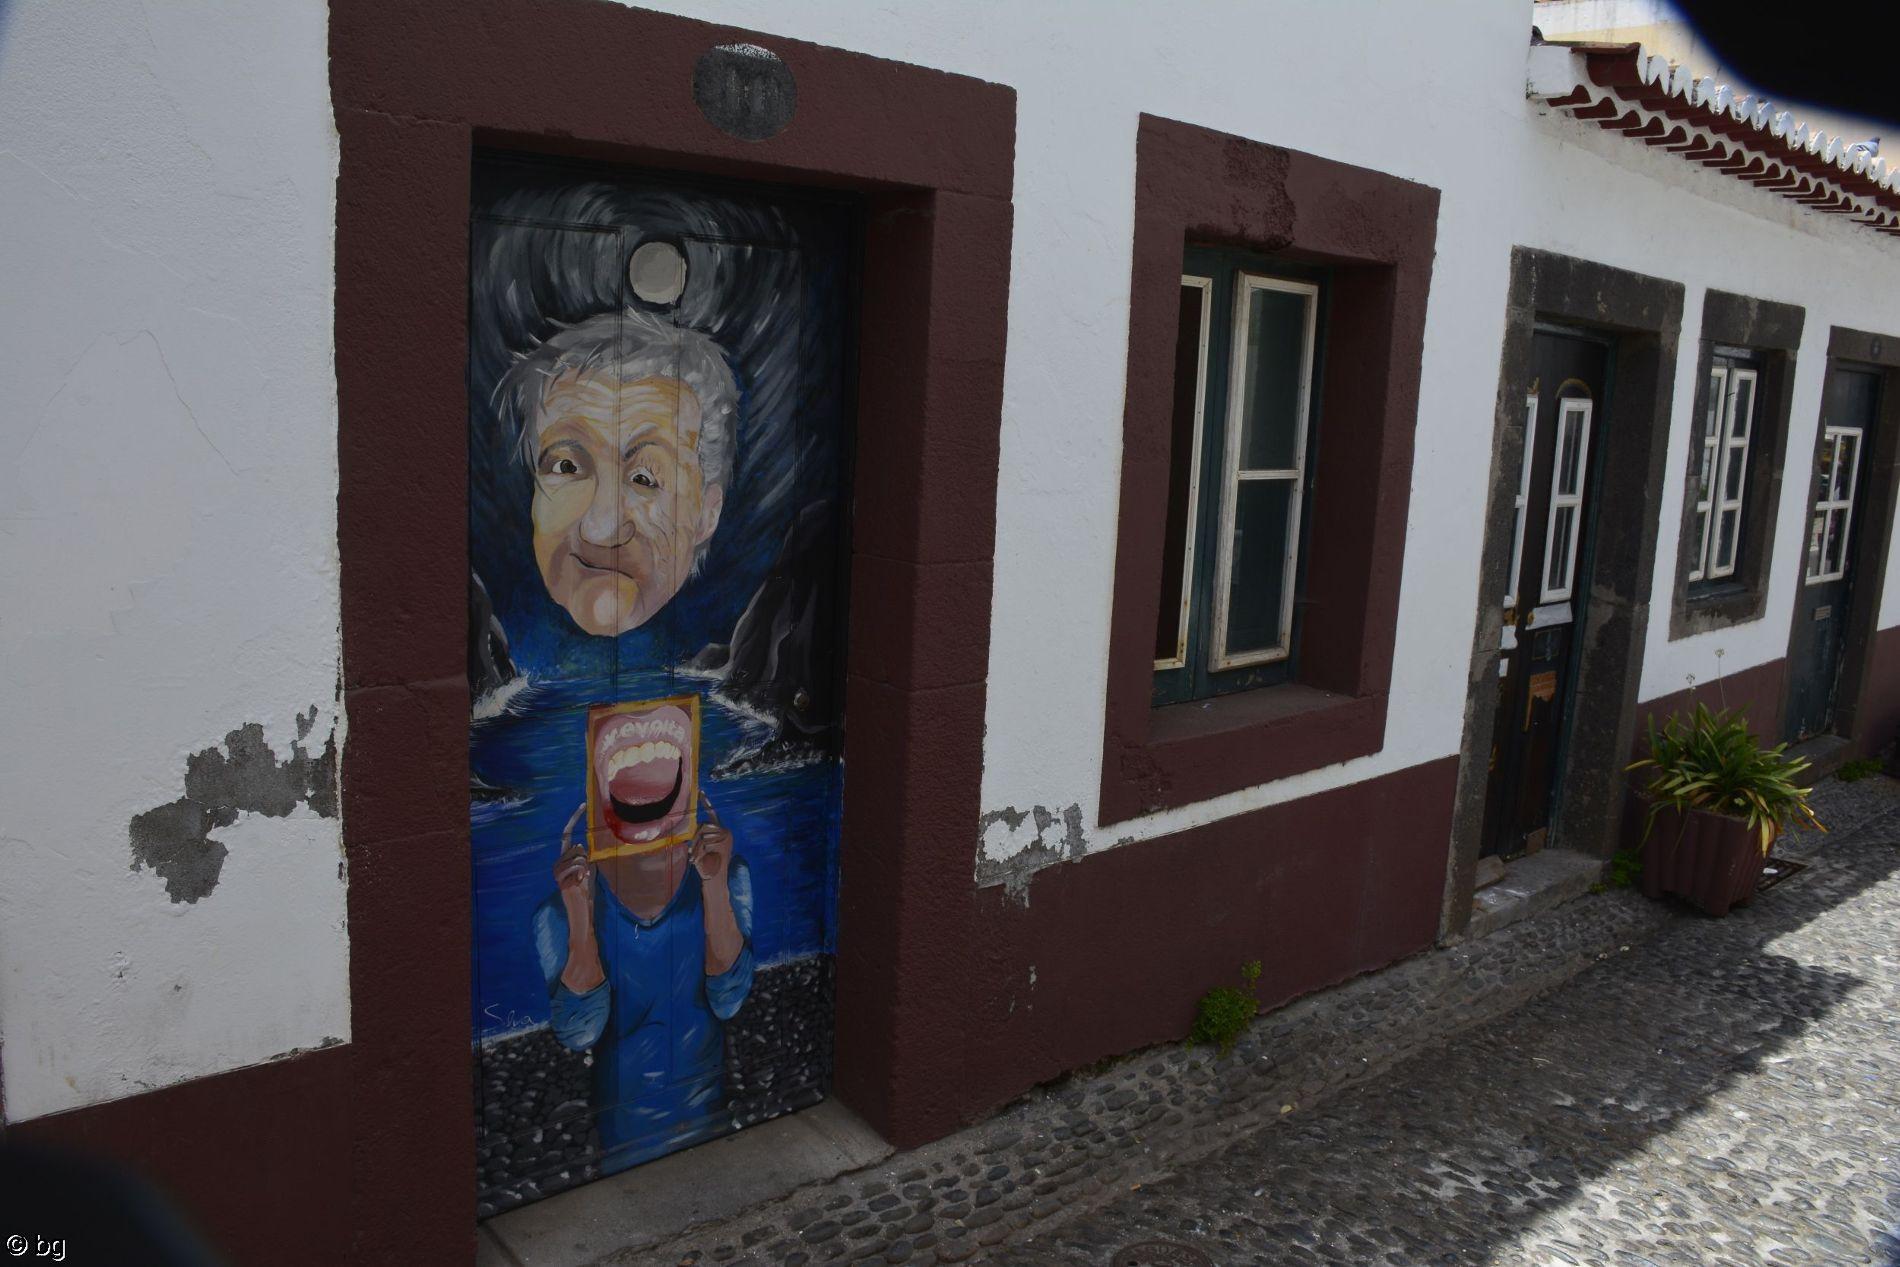 rue-typique-de-funchal-madere-5